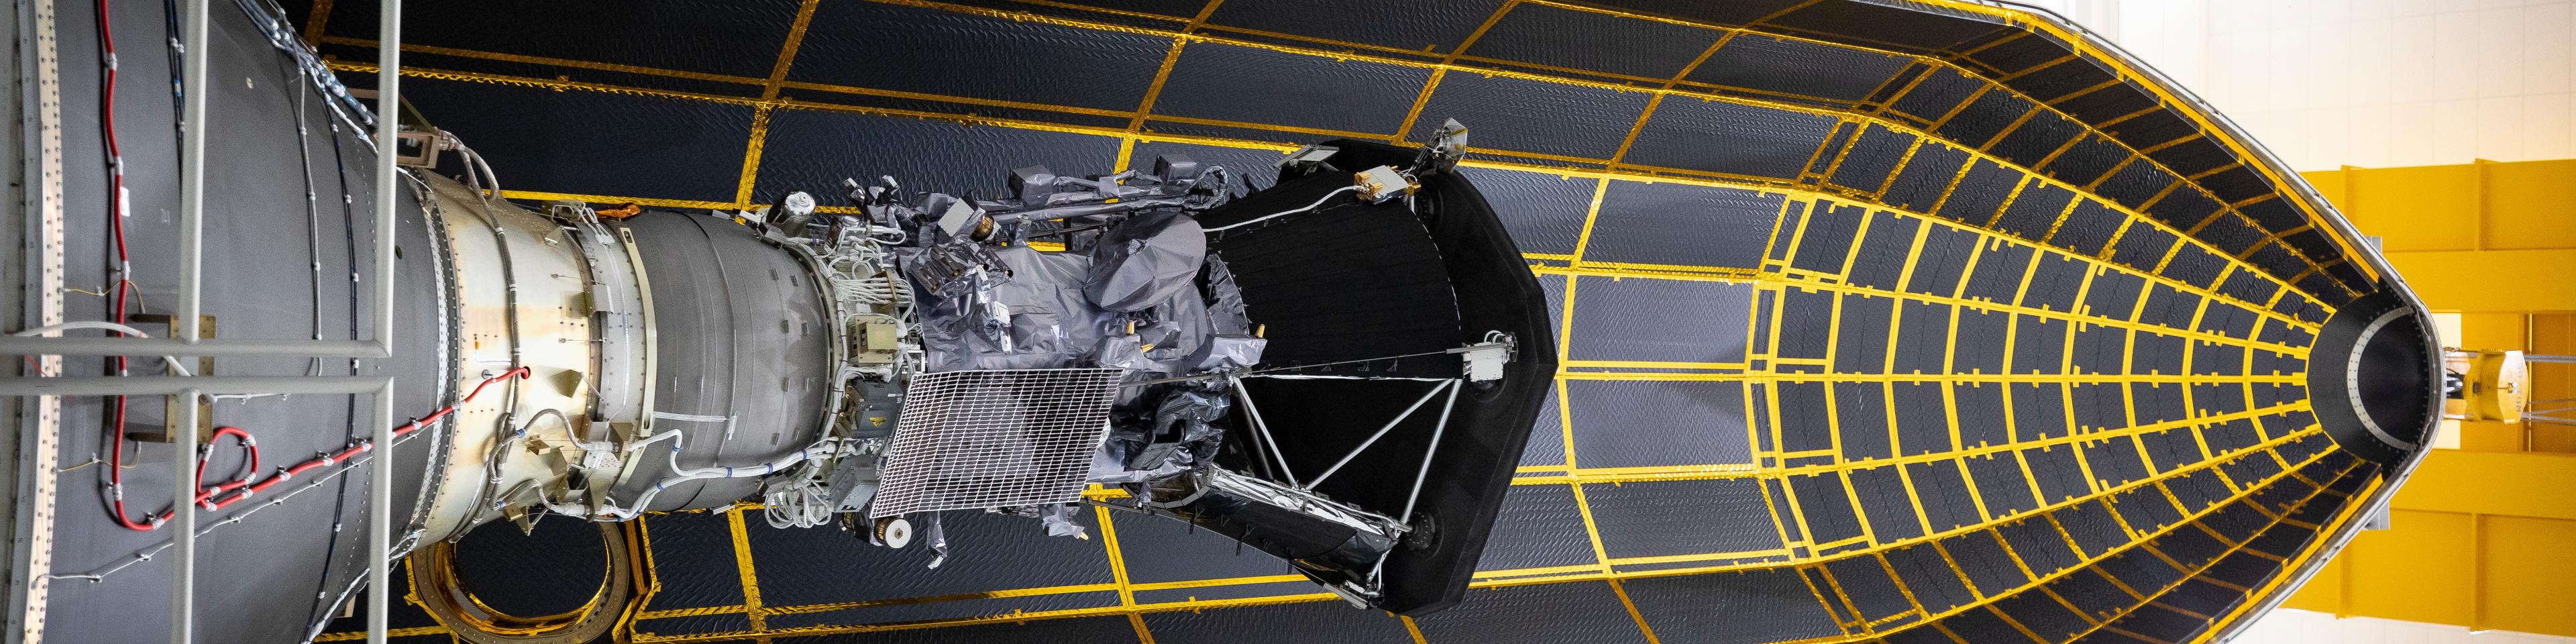 carbon fiber composite payload fairings for space launch vehicle